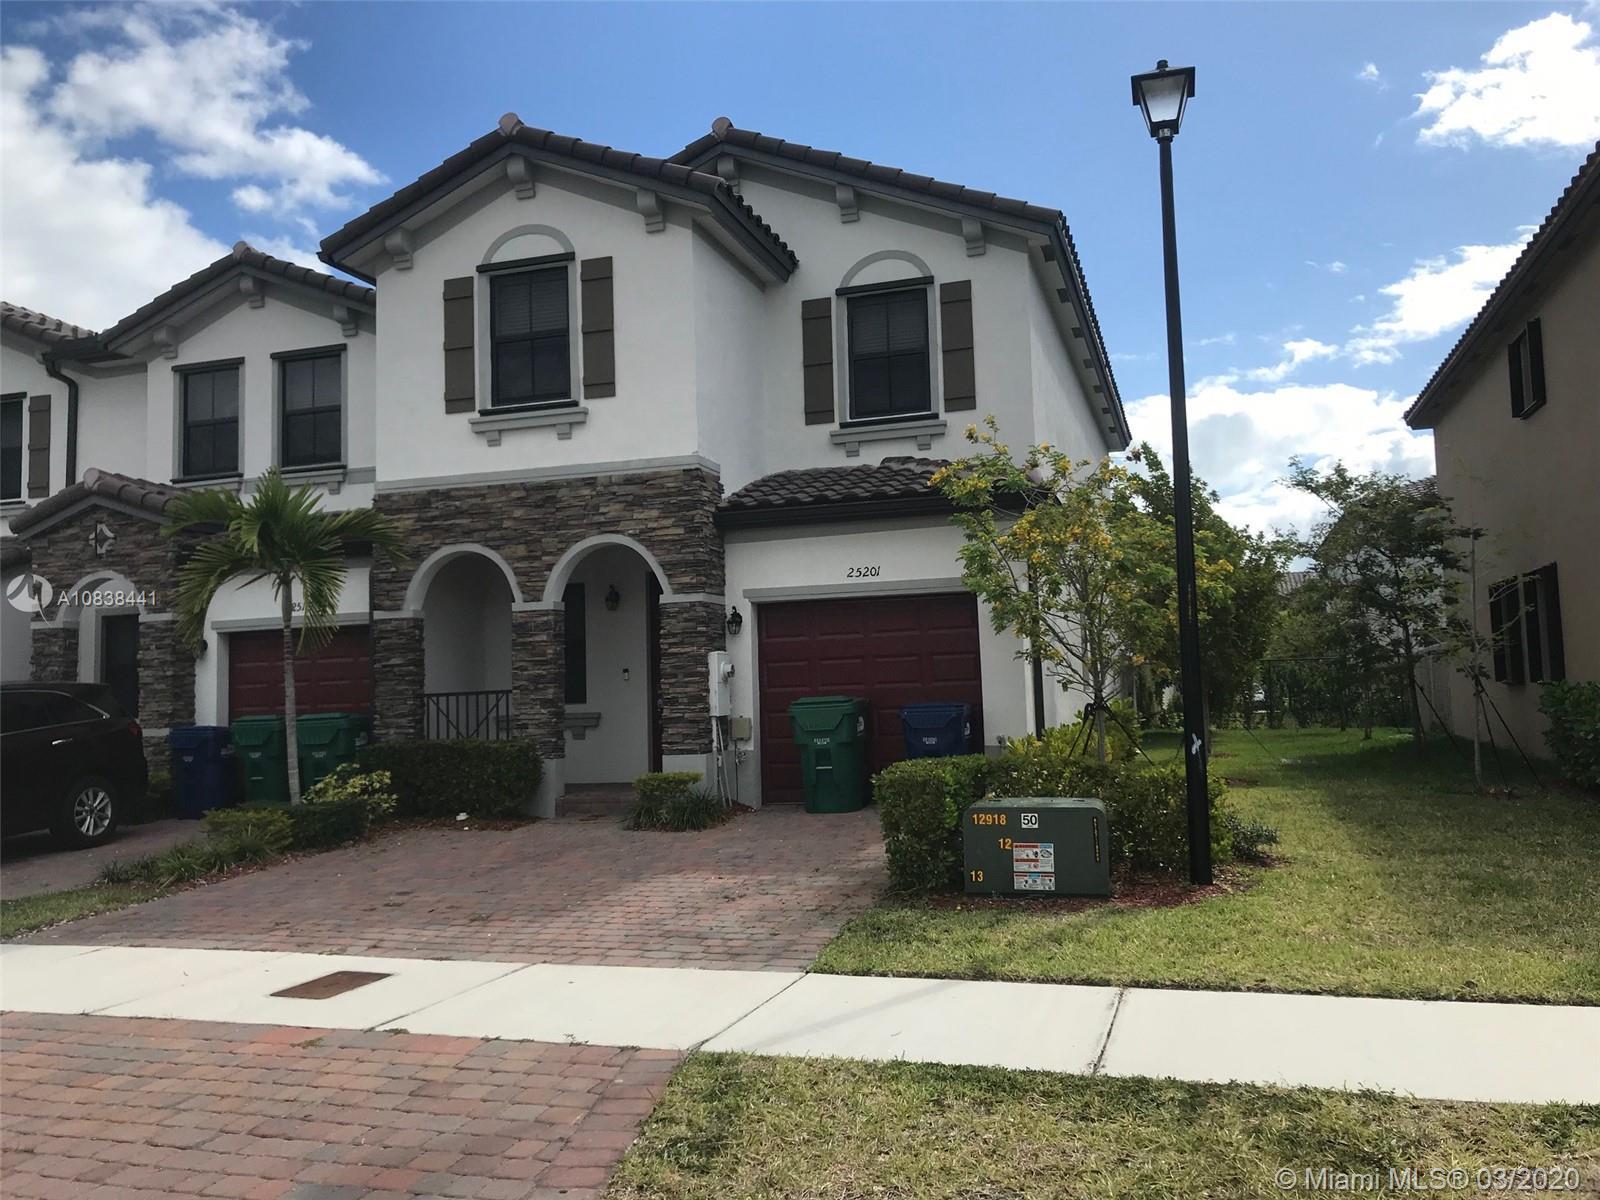 25201 SW 114th Ct, Homestead, FL 33032 - Homestead, FL real estate listing